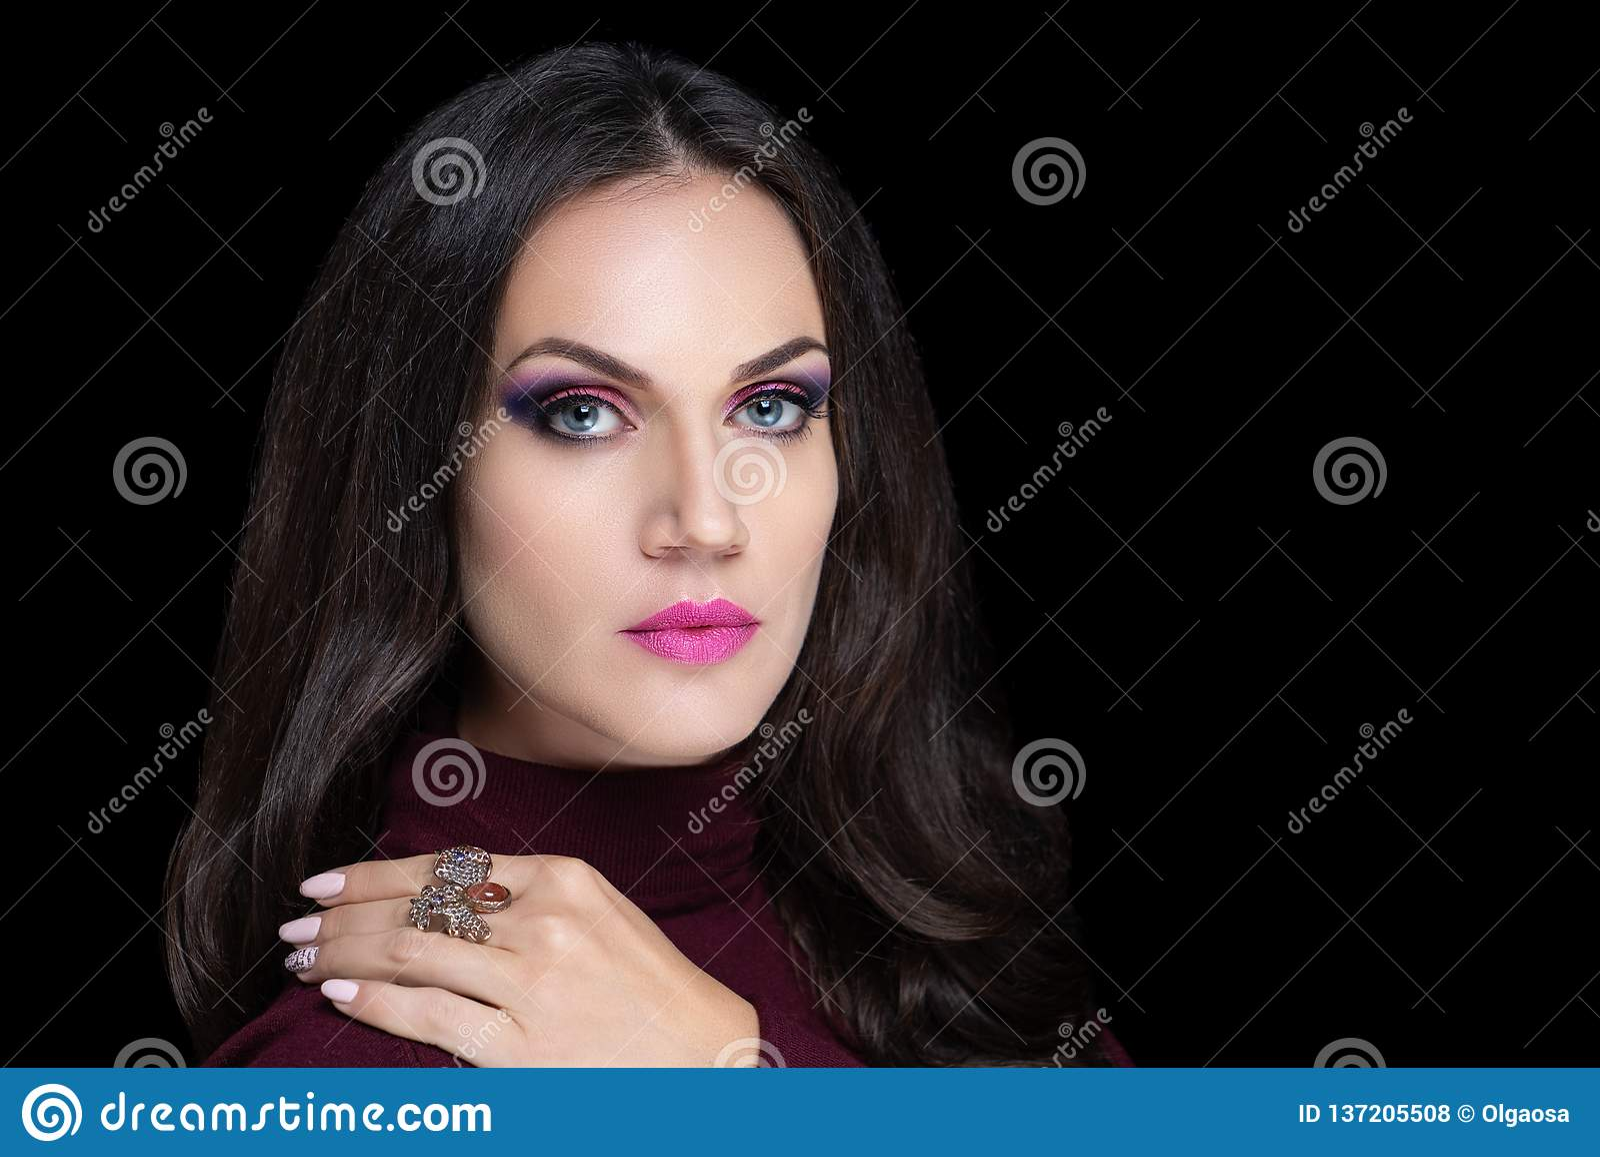 Beauty brunette face